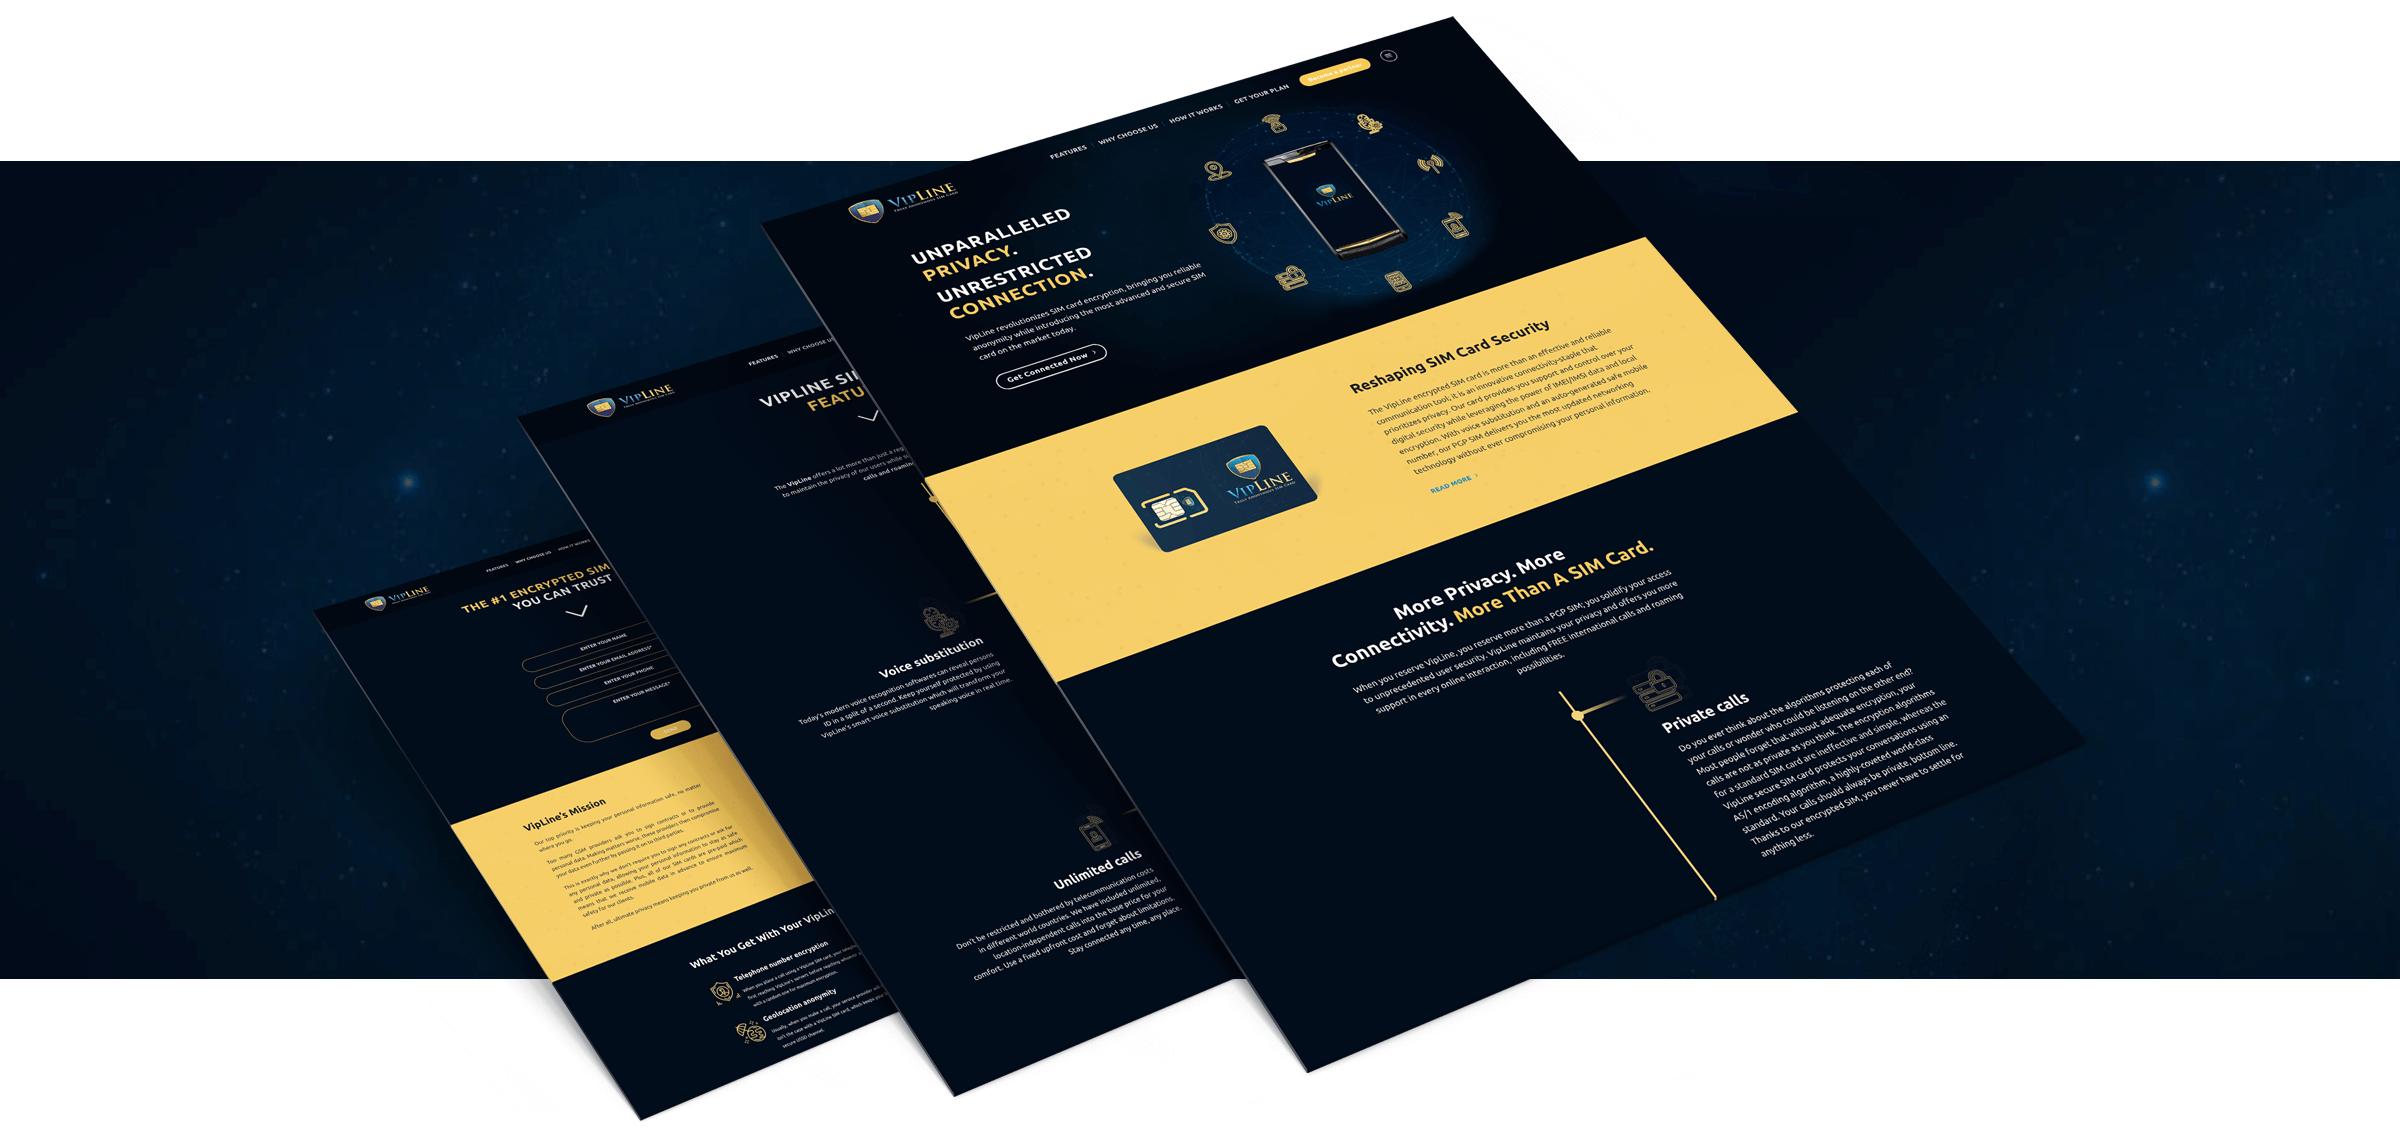 ux ui web dizainu kurimas